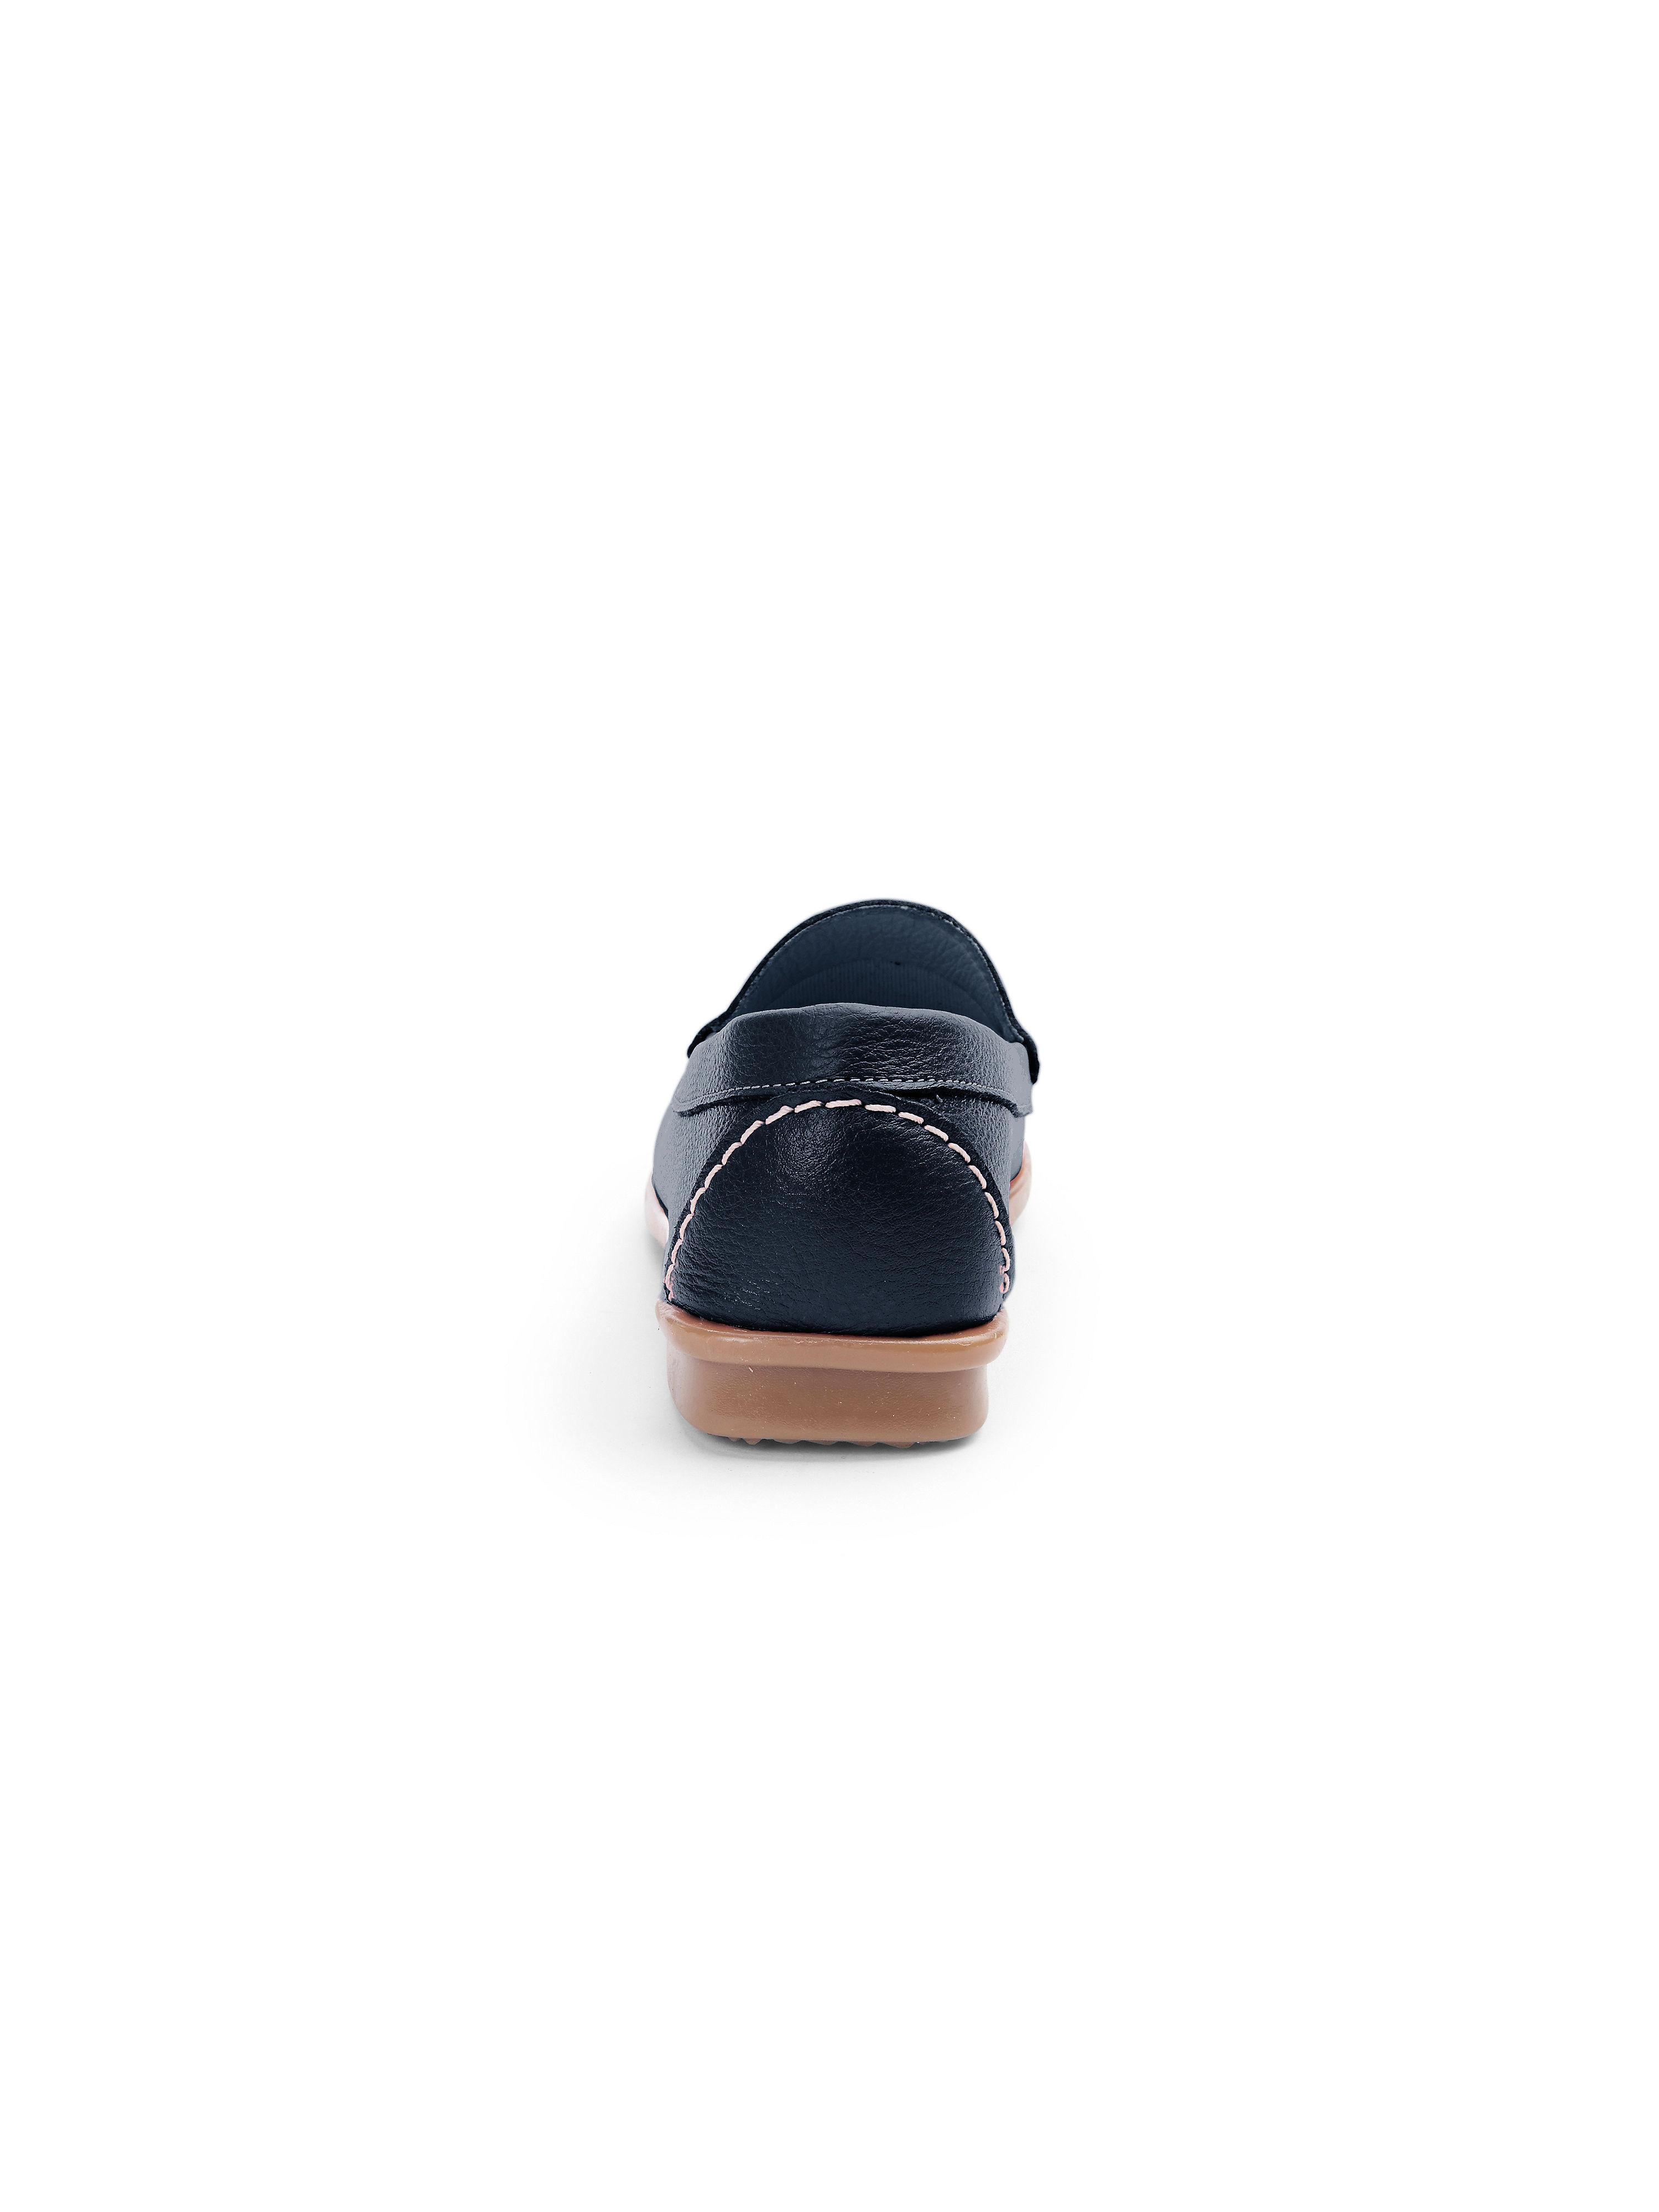 Peter Marine Hahn - Mokassin aus 100% Leder - Marine Peter Gute Qualität beliebte Schuhe 208c62